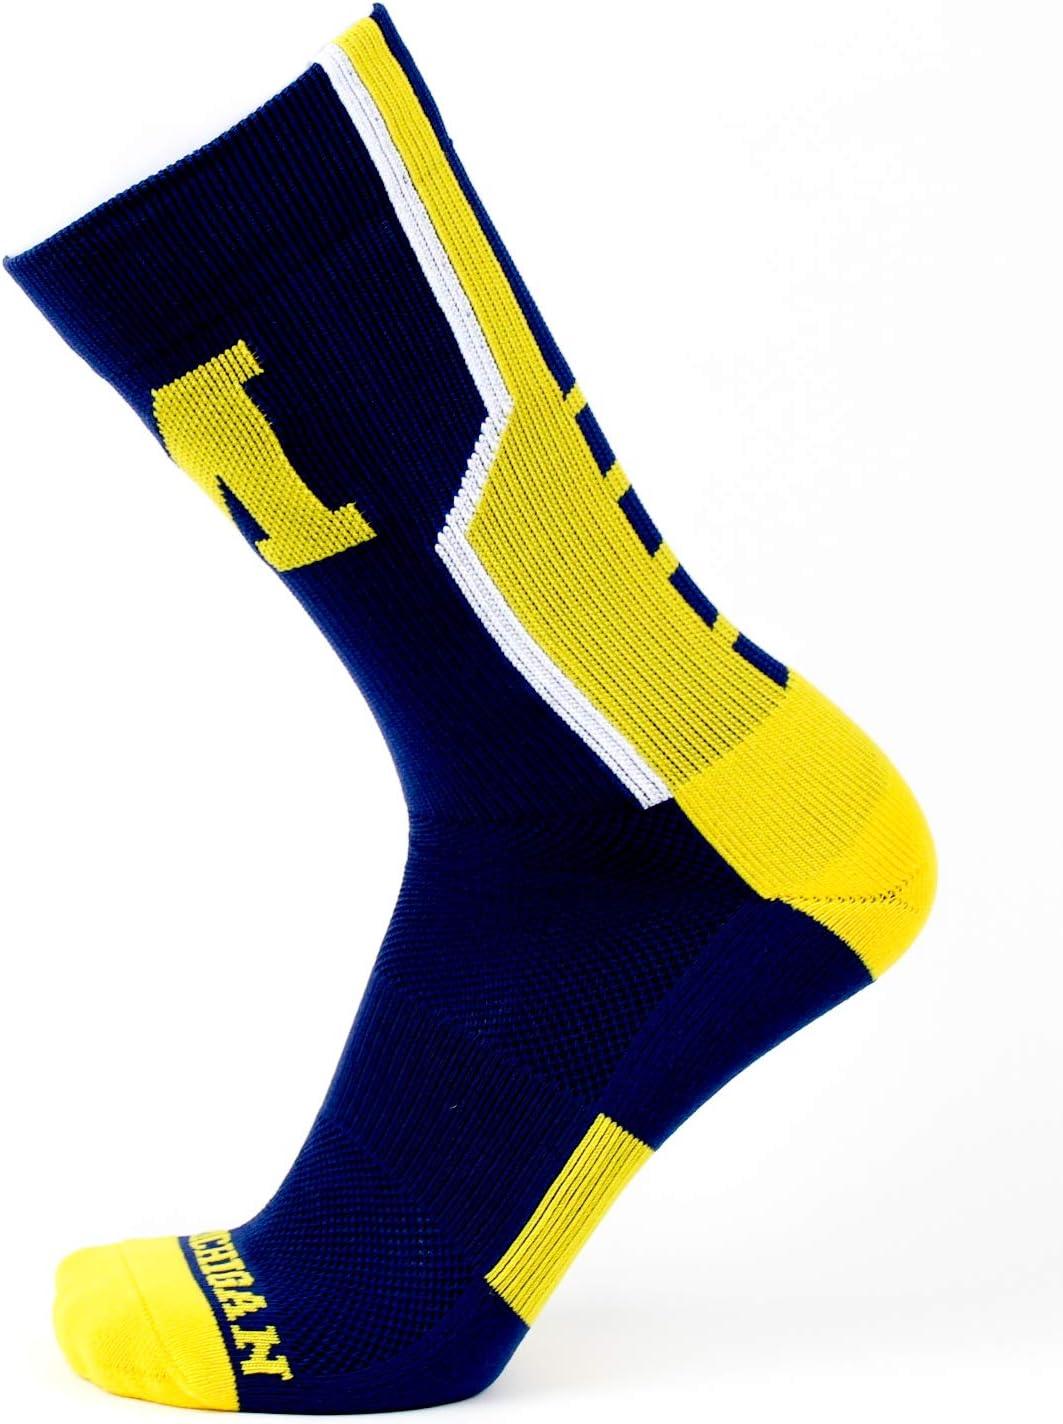 One Size NCAA Michigan Wolverines Sport Socks Blue